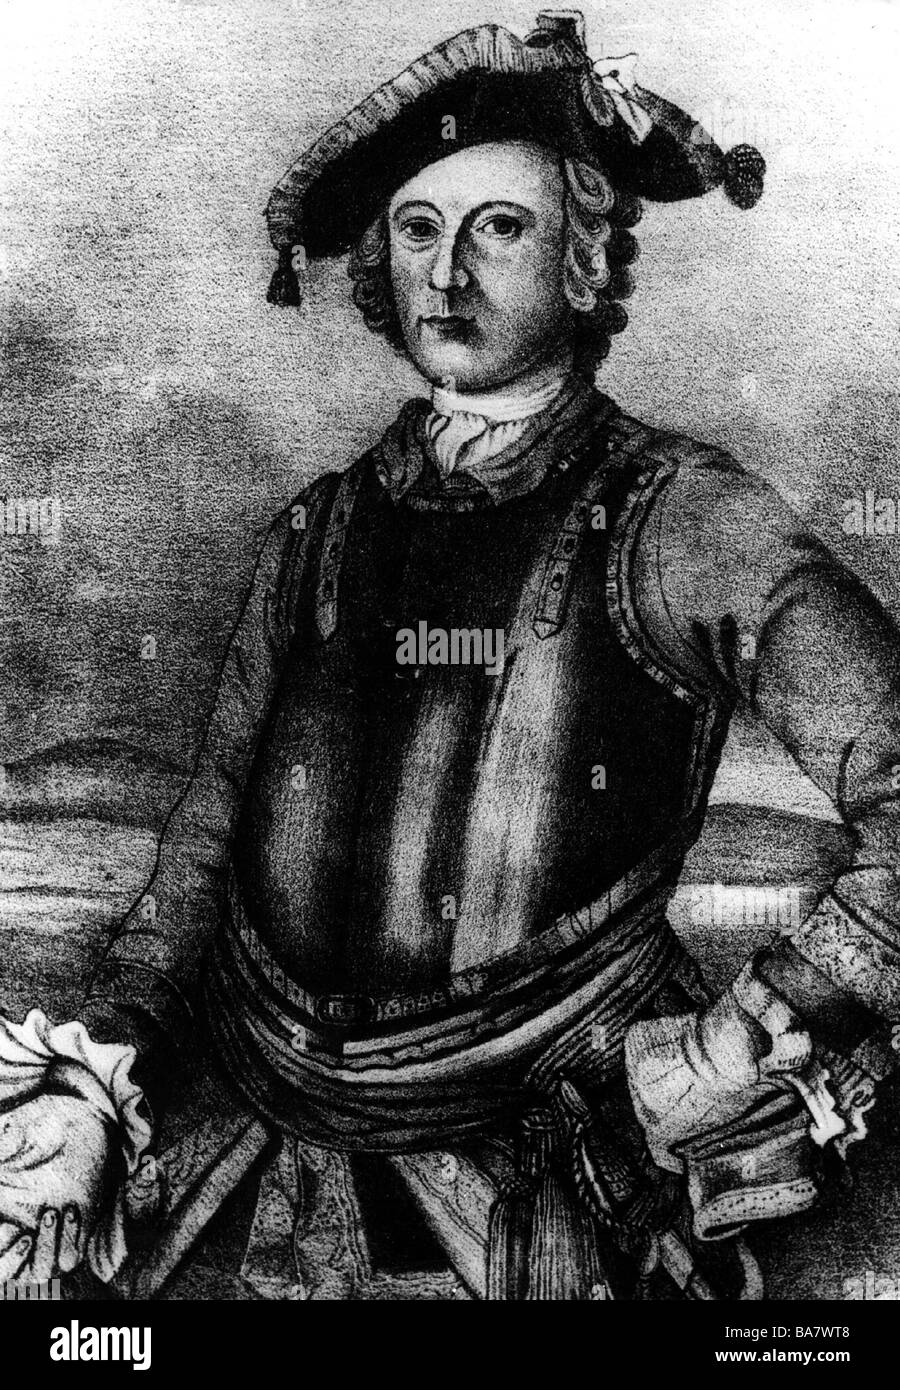 Münchhausen, Baron Karl Friedrich Hieronymus, Freiherr von, 11.5.1720 - 22.2.1797, demi-longueur, lithographie, vers 1870, après peinture, Banque D'Images